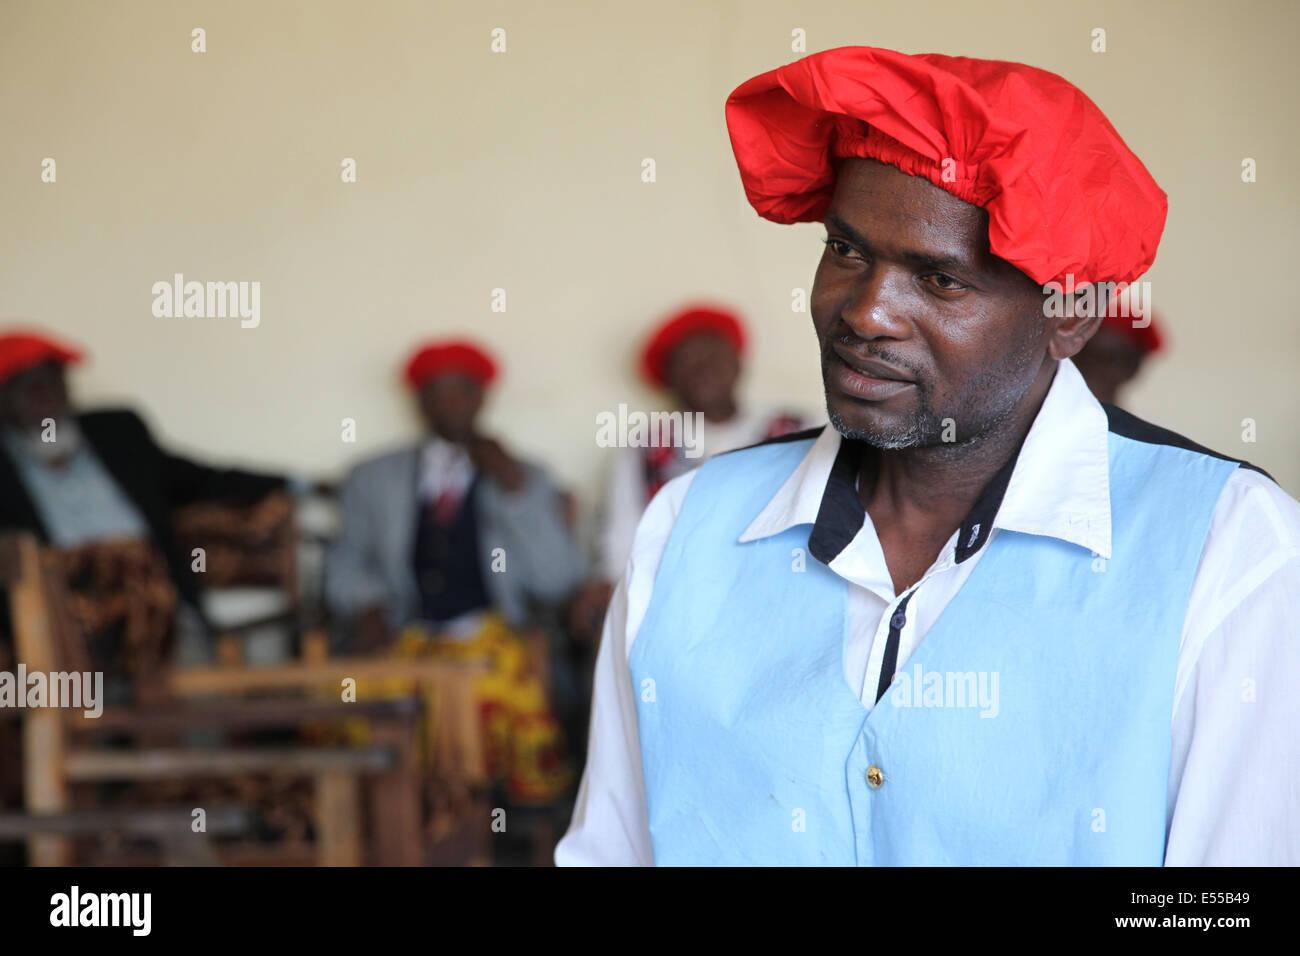 Member of the Kuta, the traditional Lozi parliament in Barotseland, Zambia - Stock Image